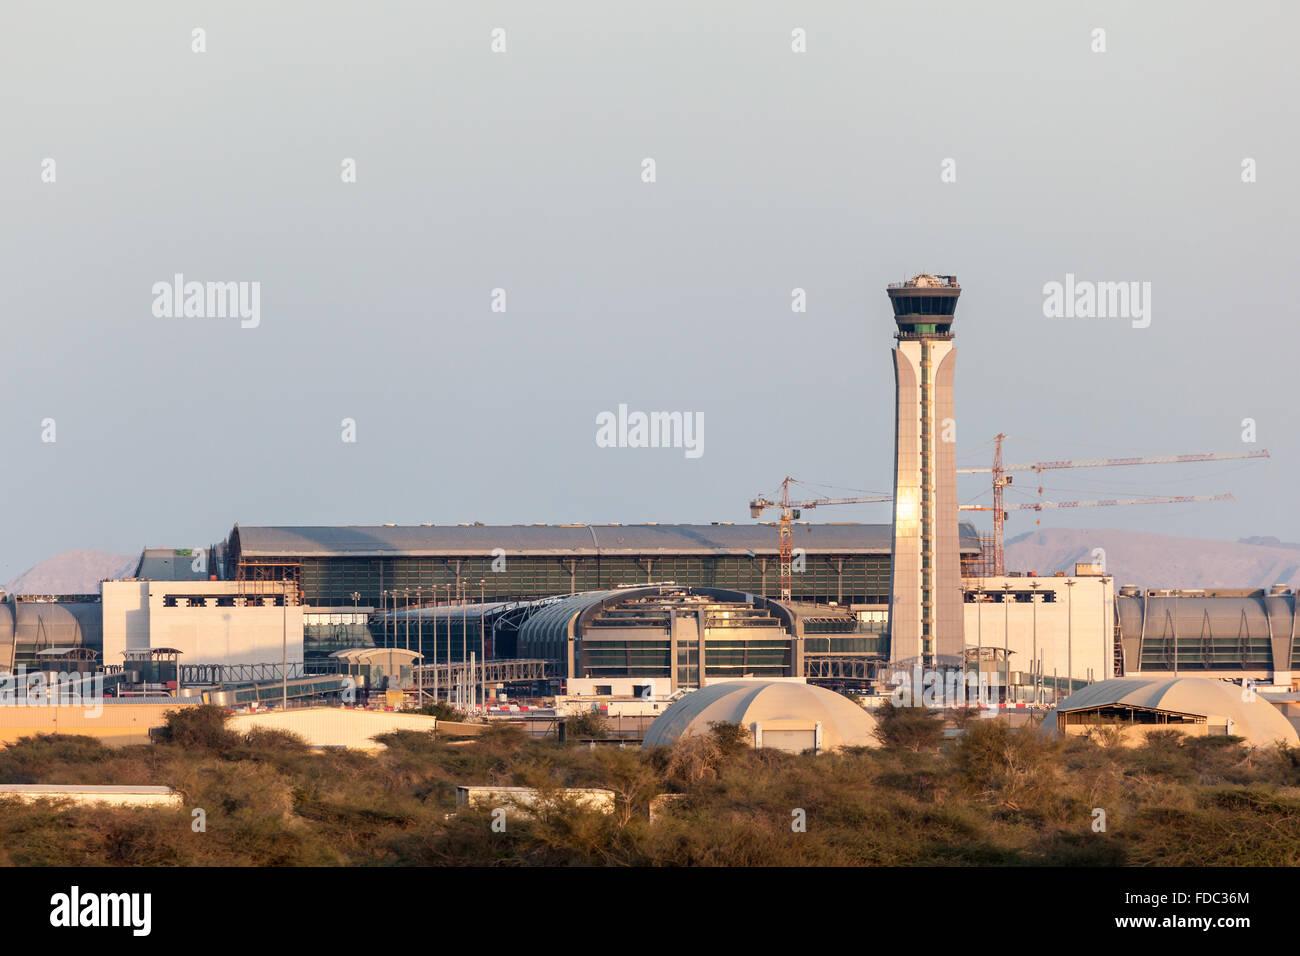 L'Aéroport International d'Oman à Mascate Photo Stock